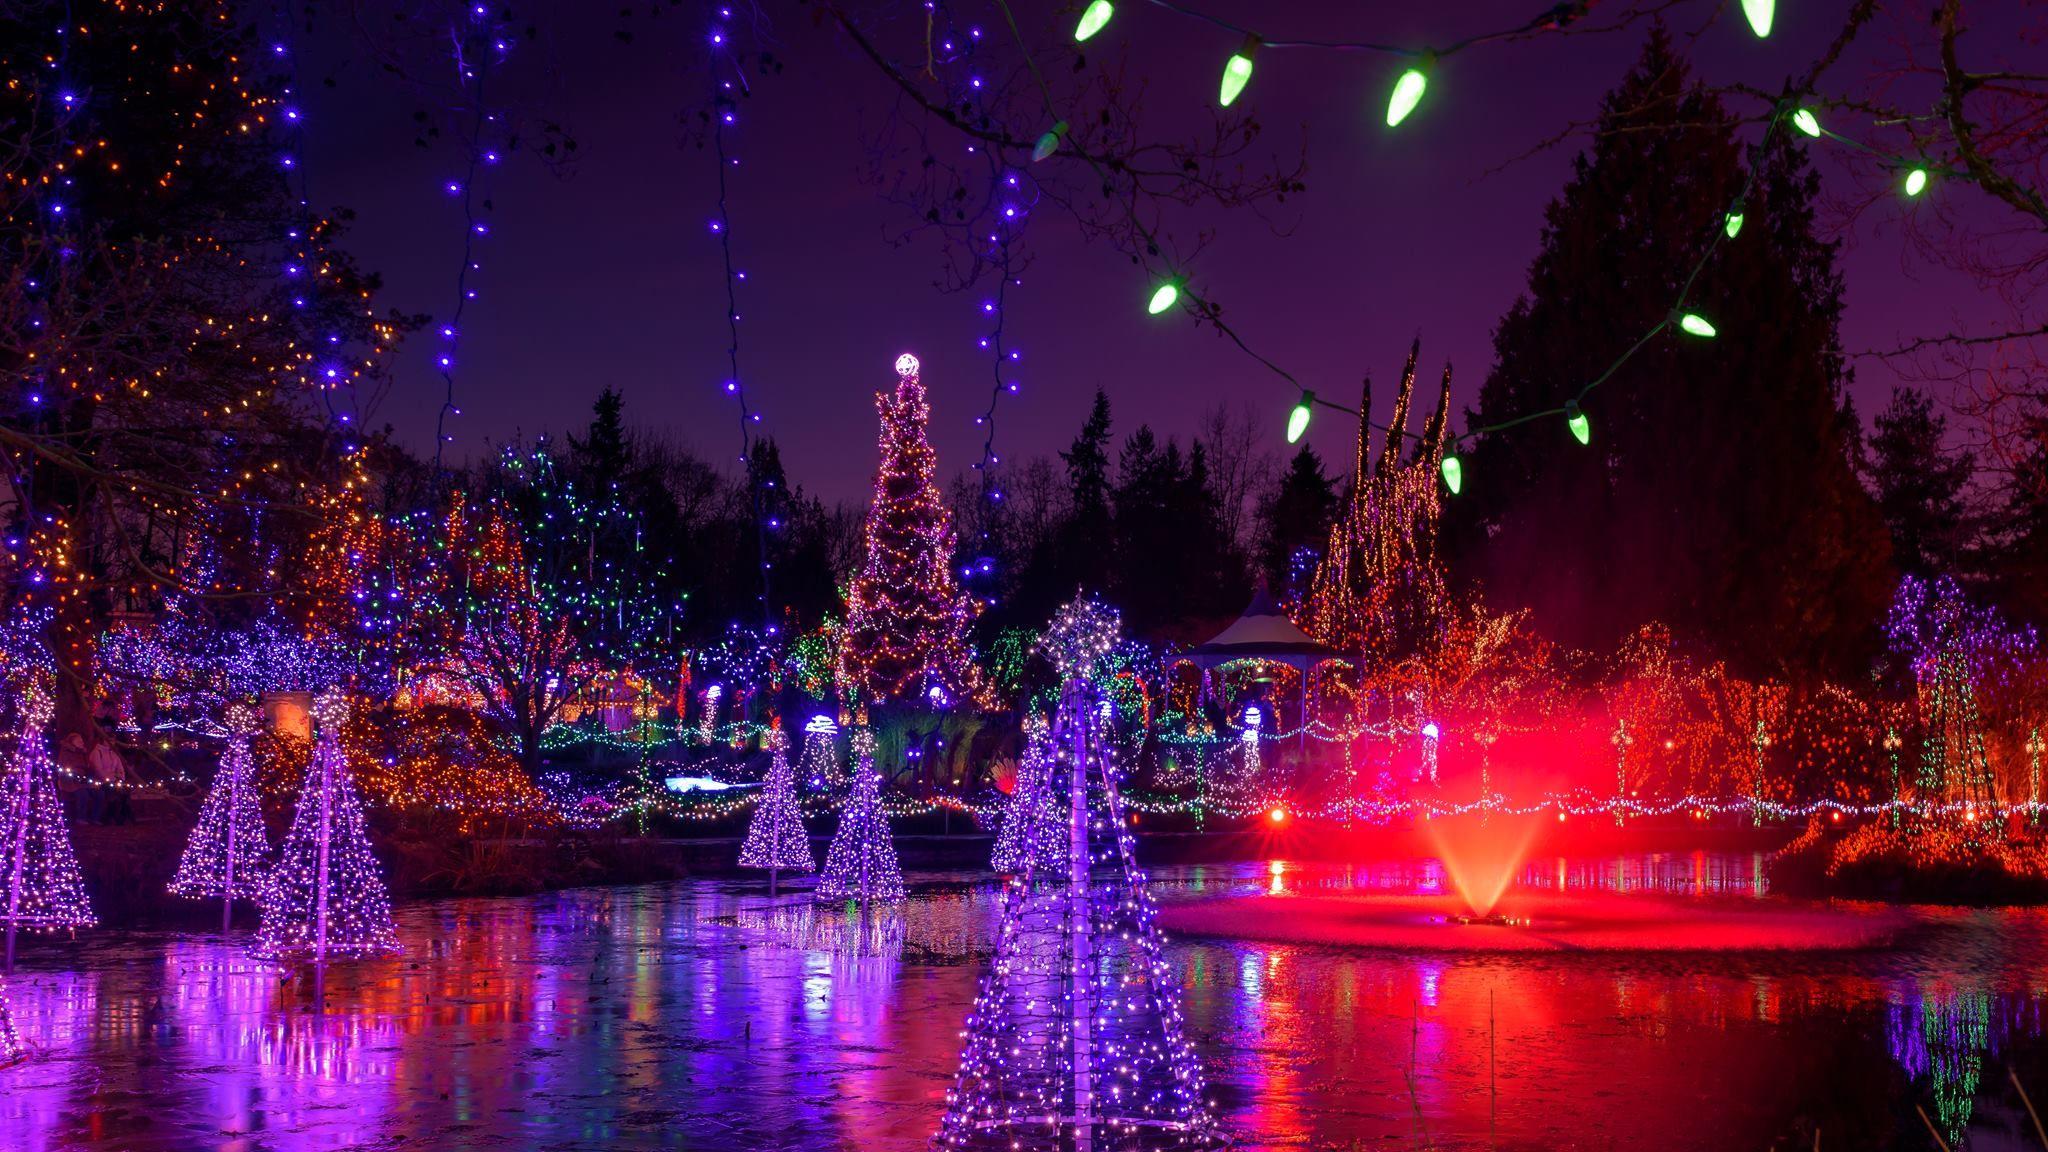 a3dcf38030df66ce1dbcb196d375efc2 - Van Dusen Botanical Gardens Christmas Lights